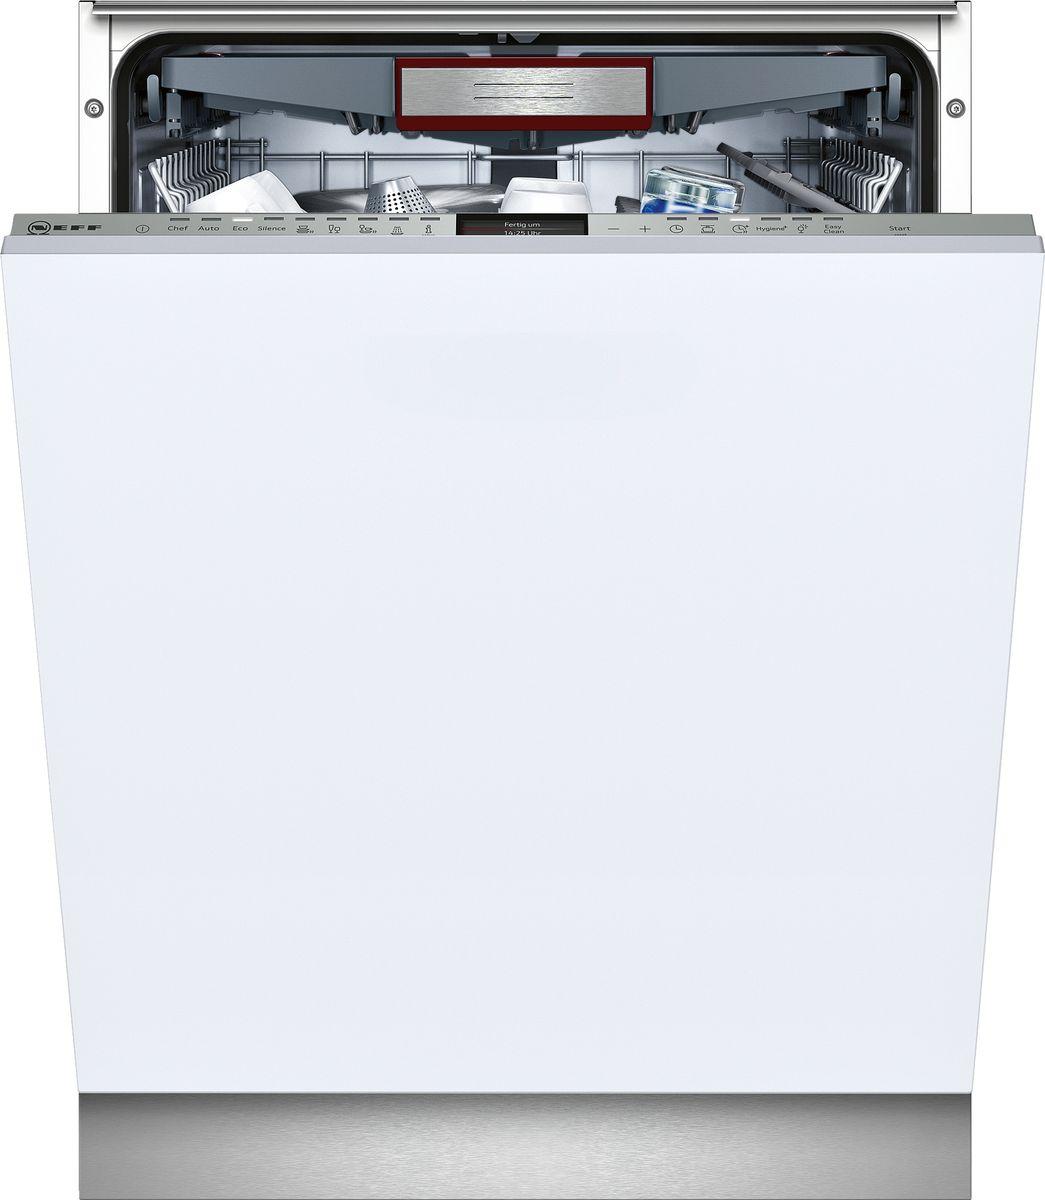 S716T80X1E - GV 6801 T VS Geschirrspüler 60 cm Vollintegrierbar mit VarioScharnier – Bild 1